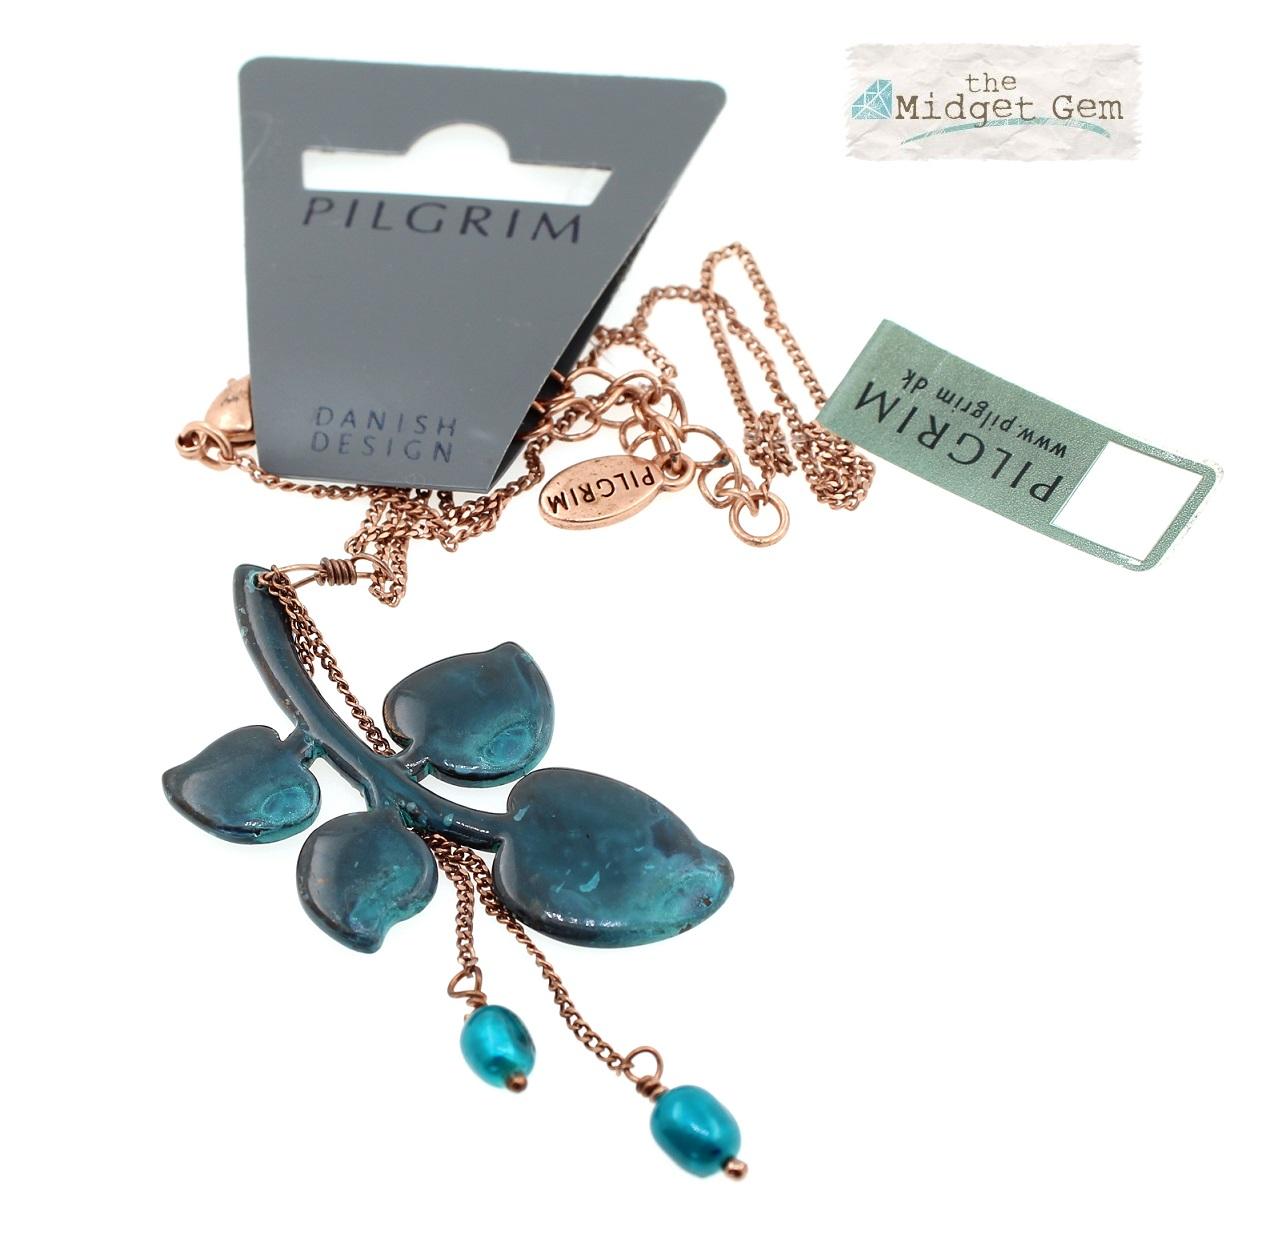 PILGRIM - Patina - Pendant Necklace - Fired Blue Enamel /Copper BNWT